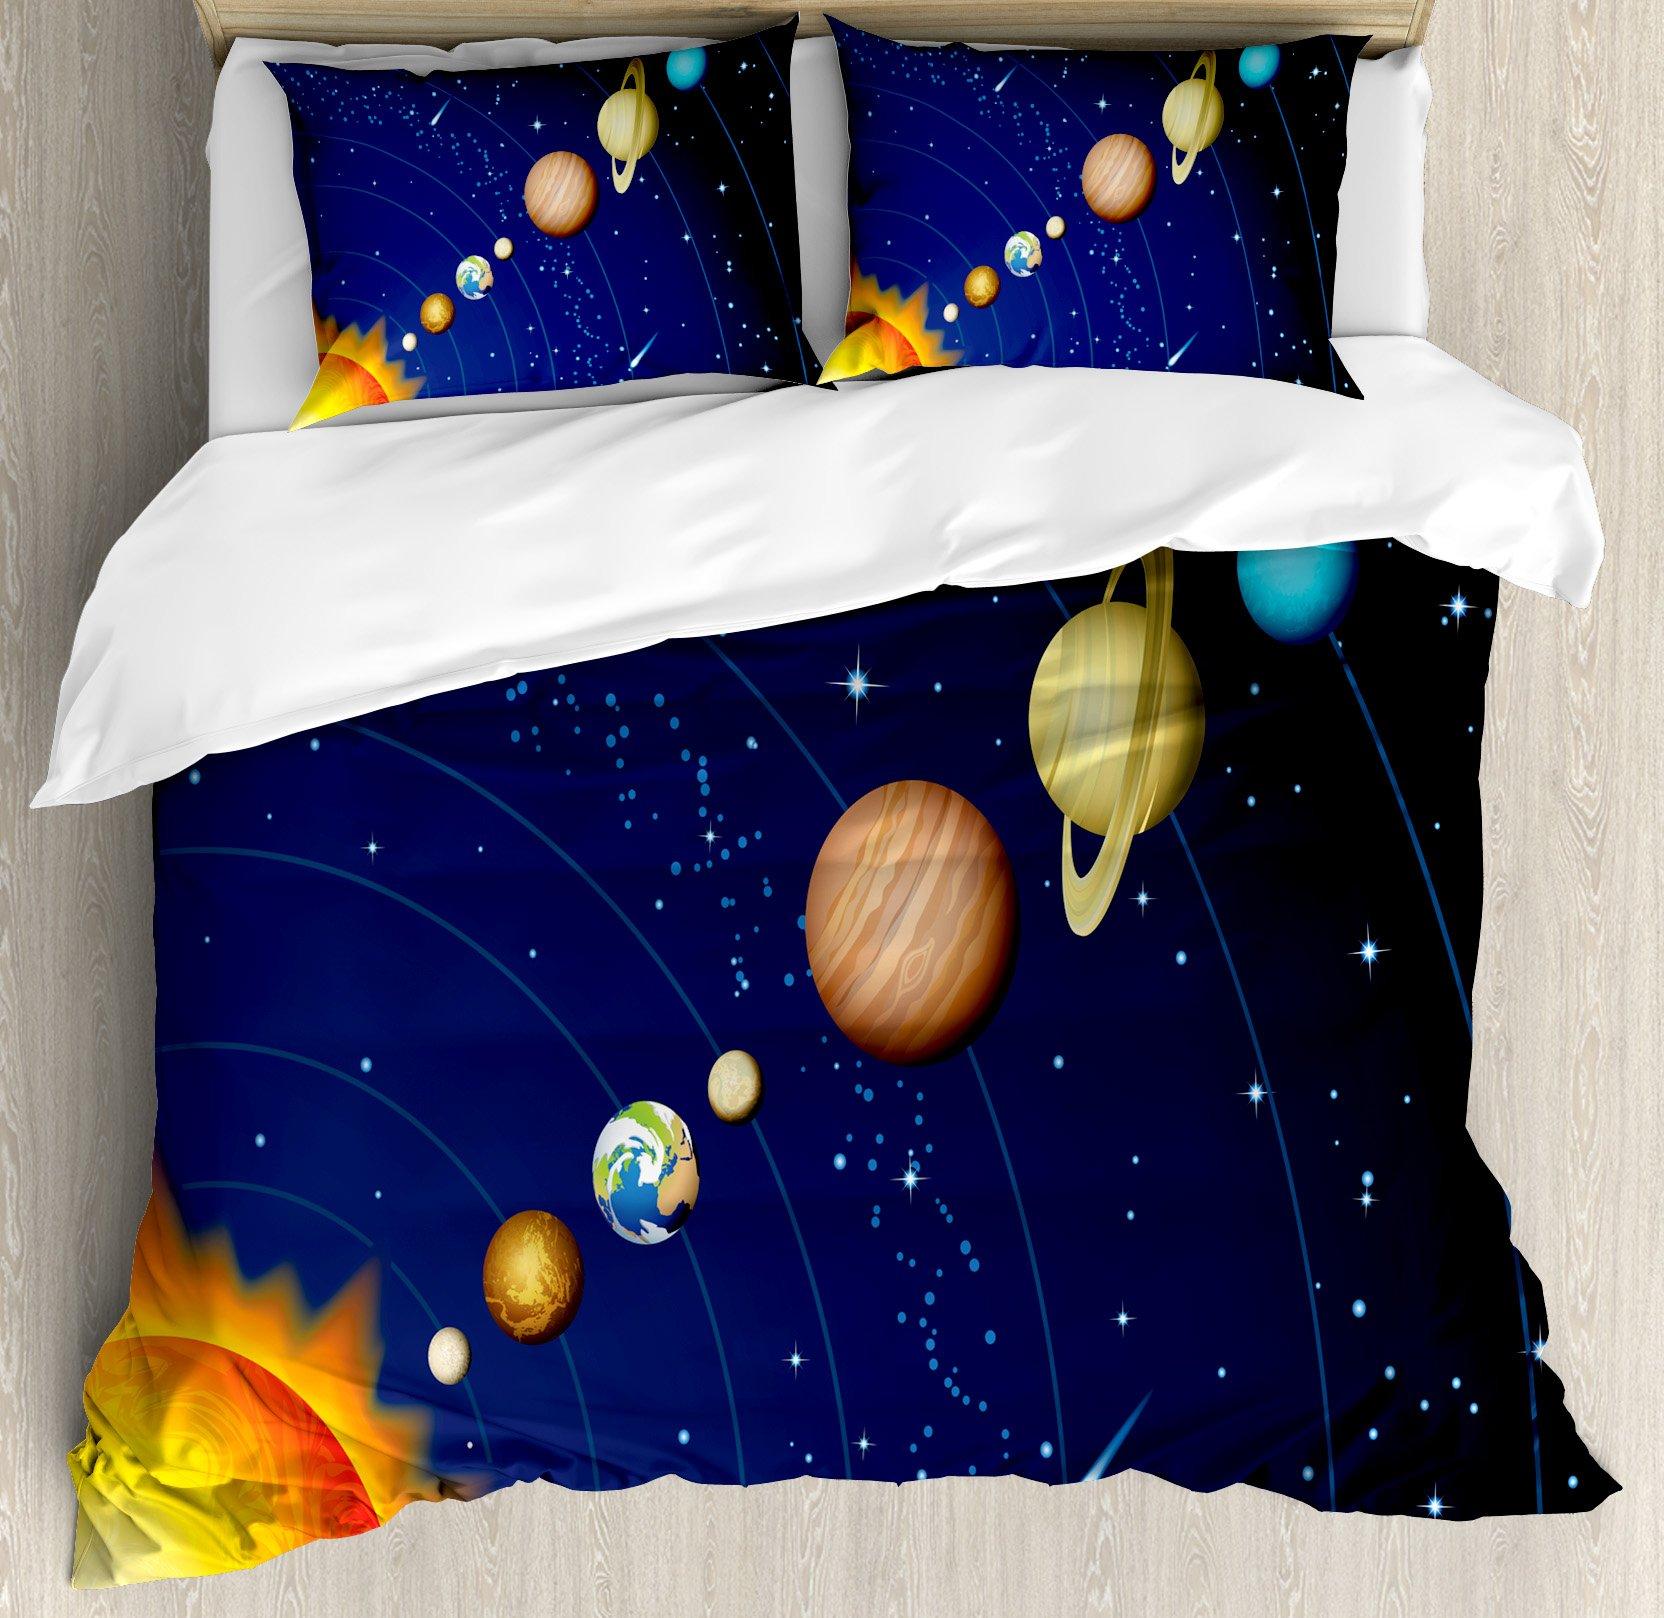 Space Duvet Cover Set by Ambesonne, Solar System with Sun Uranus Venus Jupiter Mars Pluto Saturn Neptune Image, 3 Piece Bedding Set with Pillow Shams, Queen / Full, Dark Blue Orange